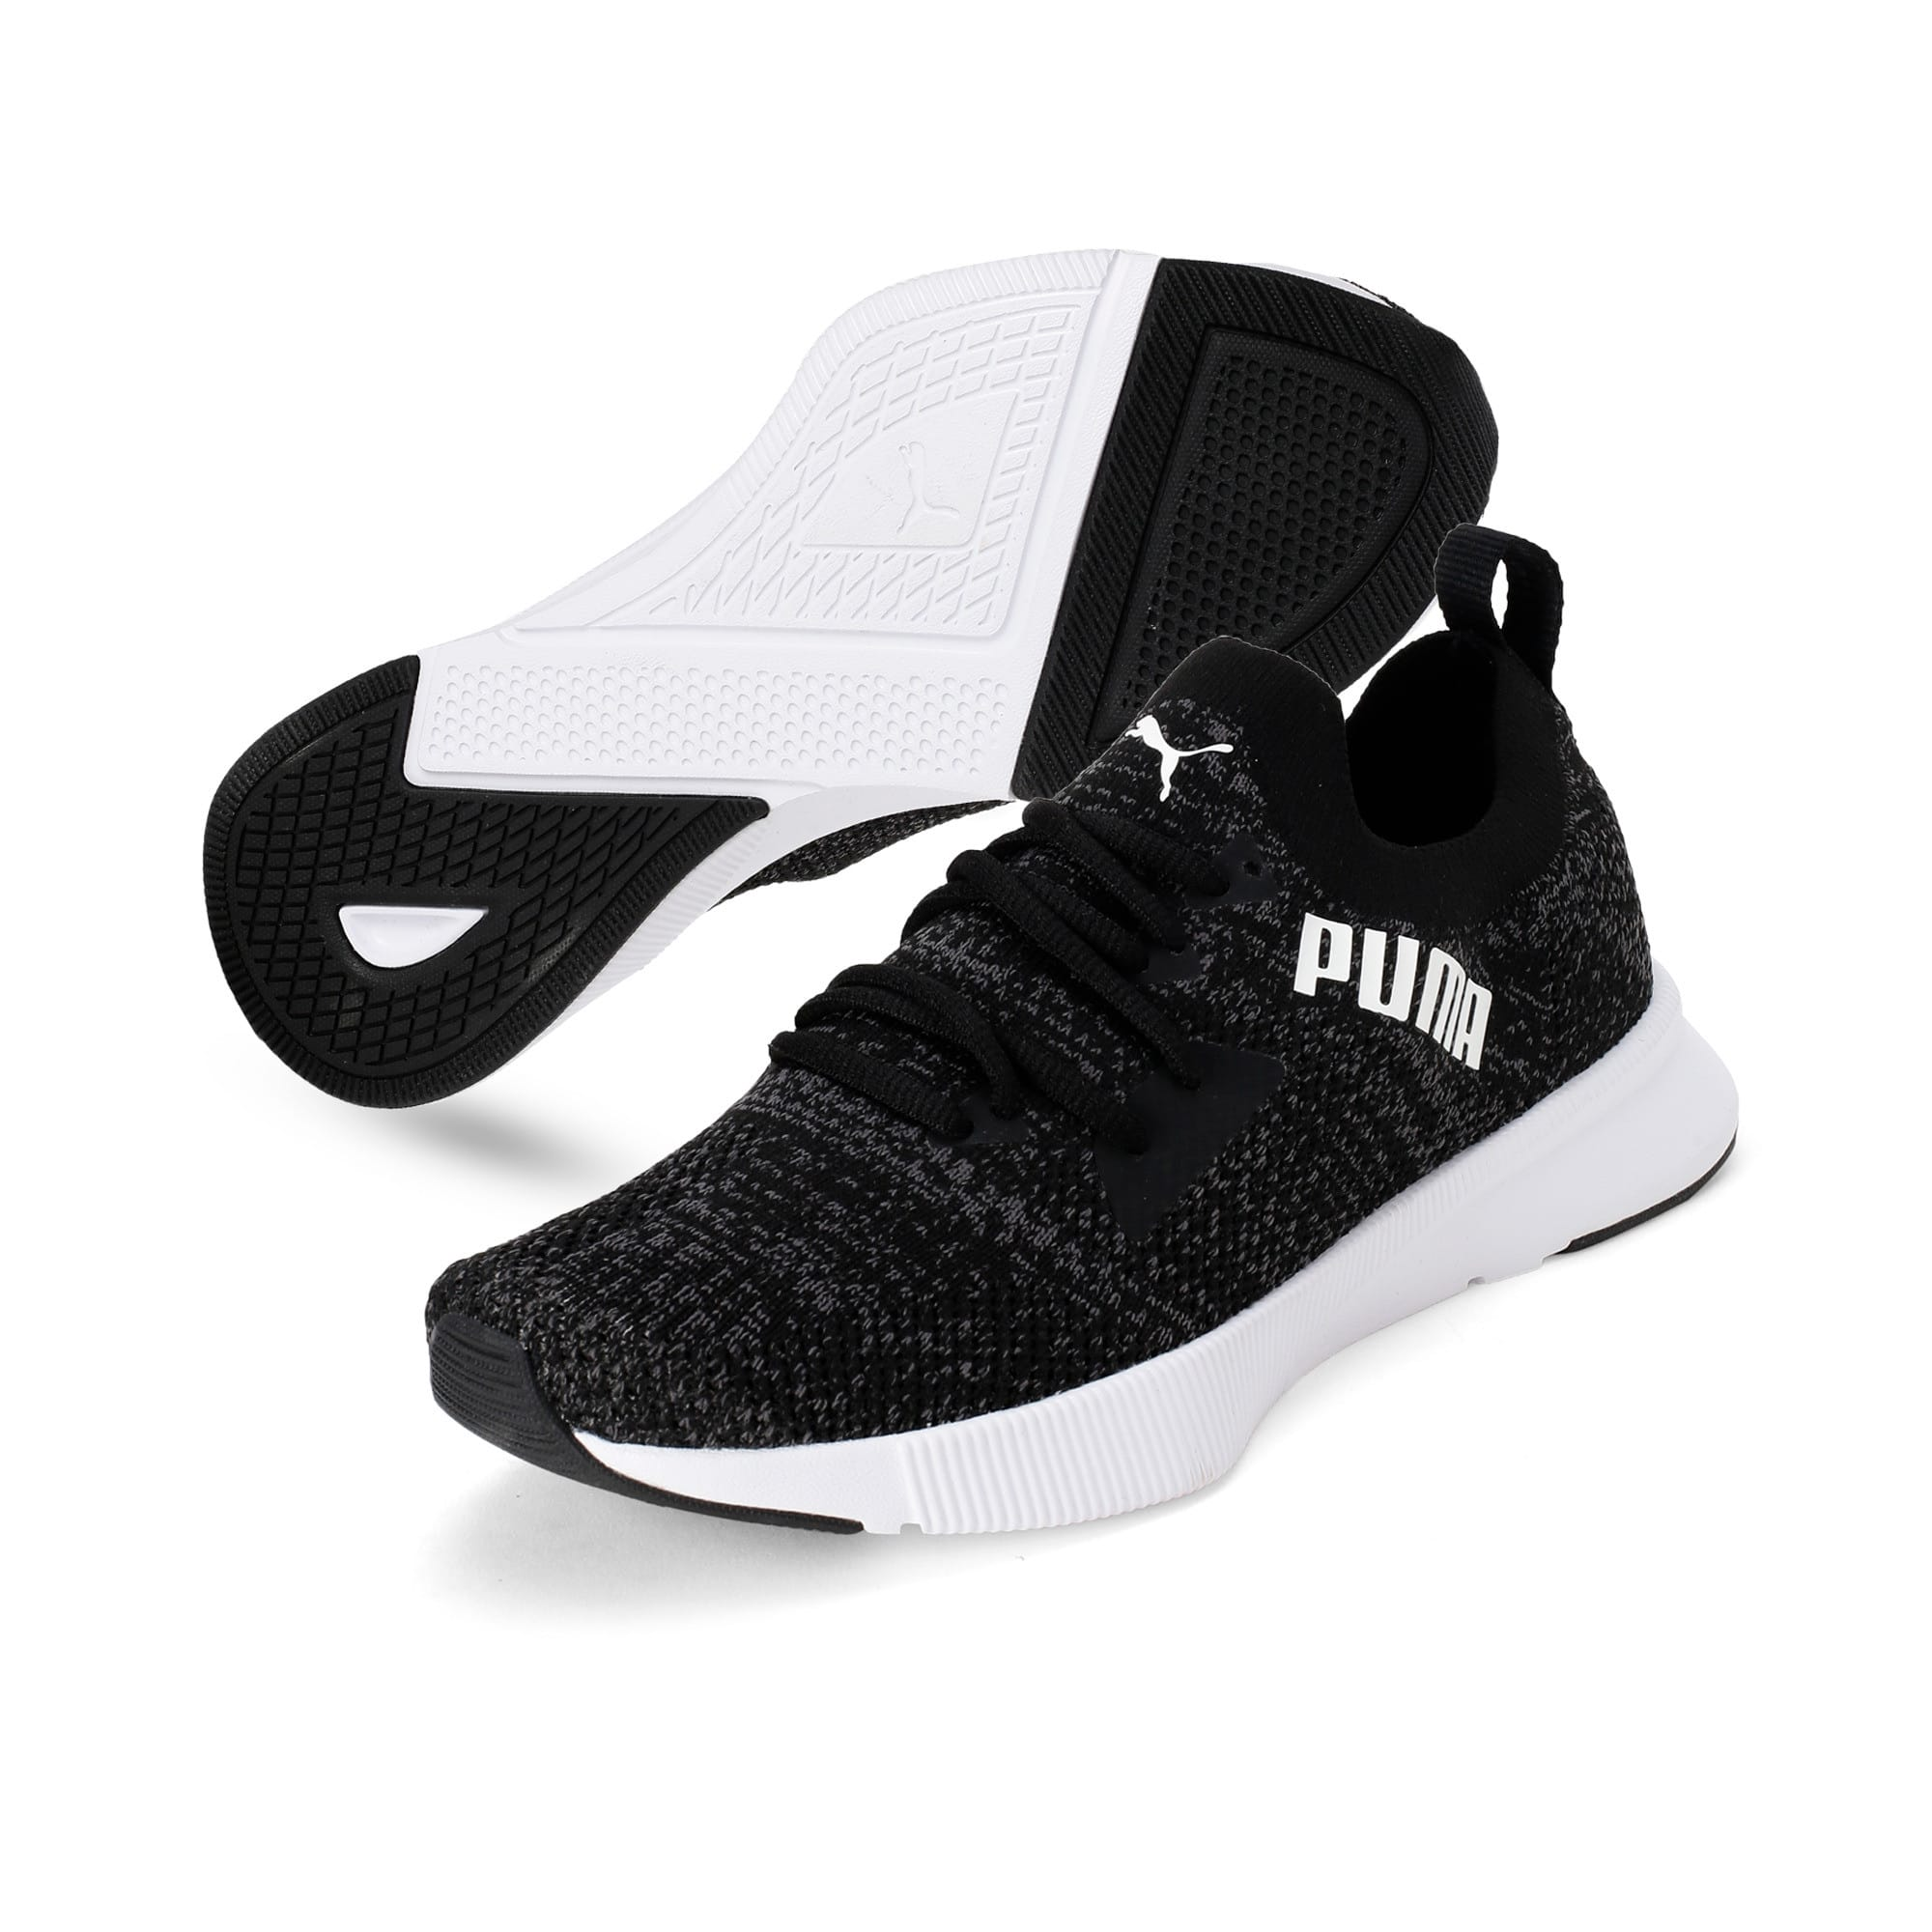 Thumbnail 6 of Flyer Women's Running Shoes, Puma Blk-Asphalt-Puma Wht, medium-IND